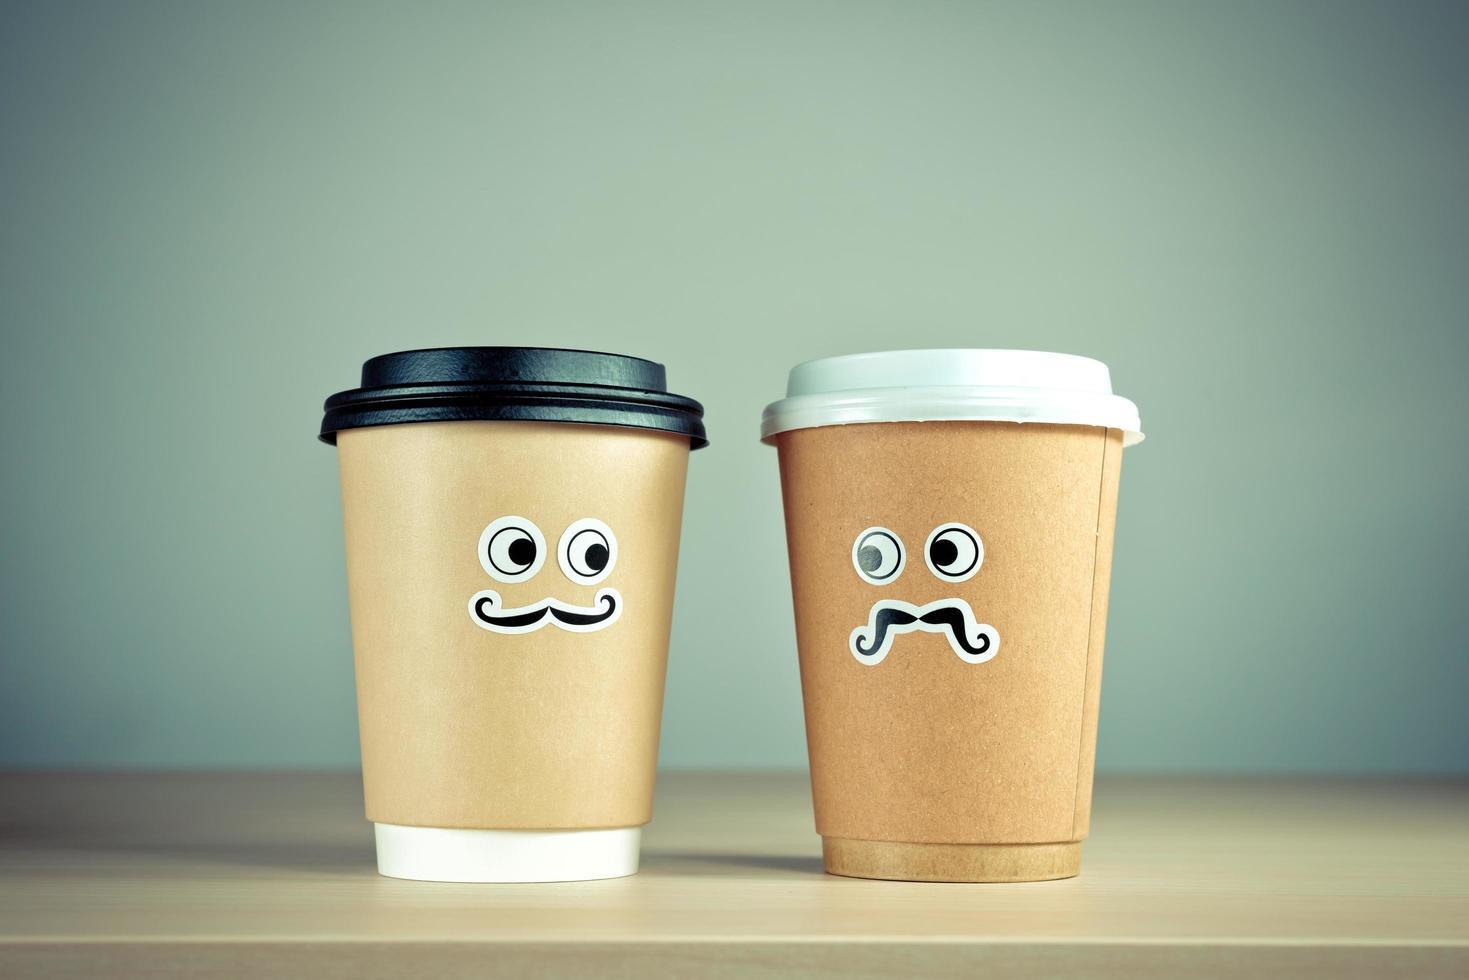 llevar personajes de la taza de café foto